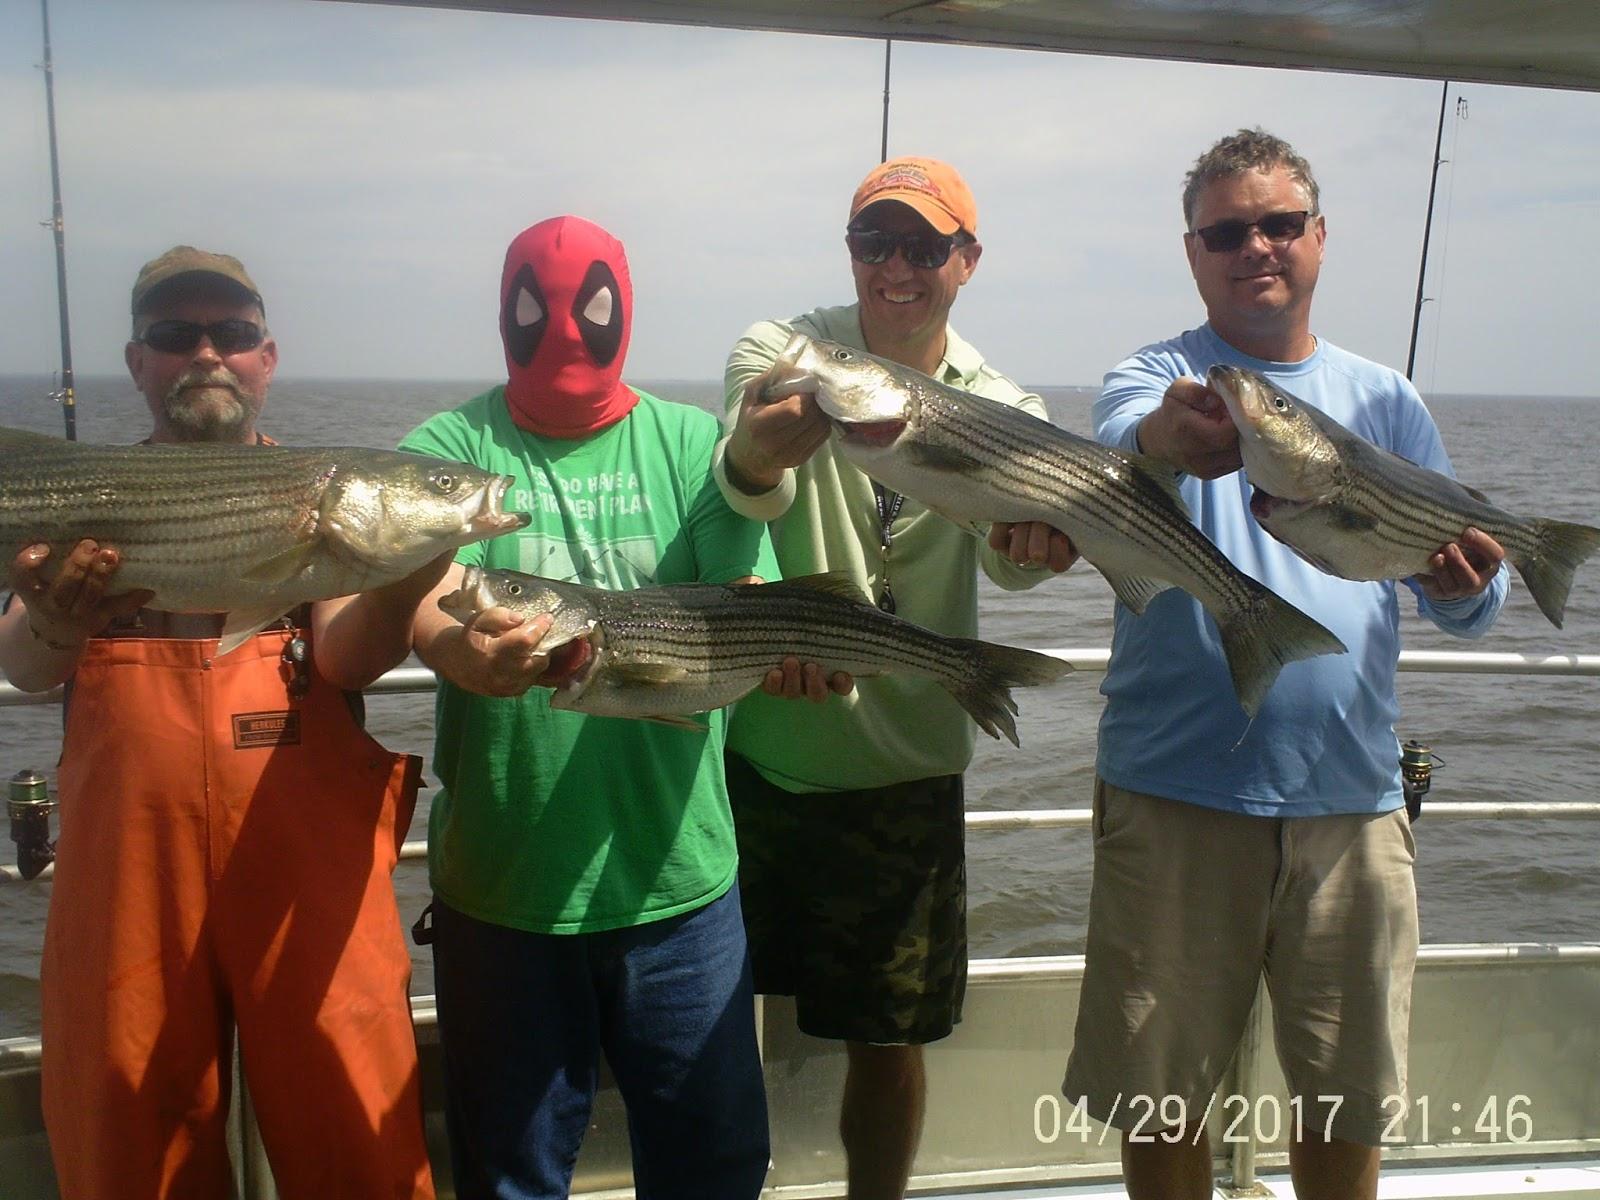 Nj salt fish 2017 04 29 seahunter atlantic highlands for Atlantic highlands fishing report